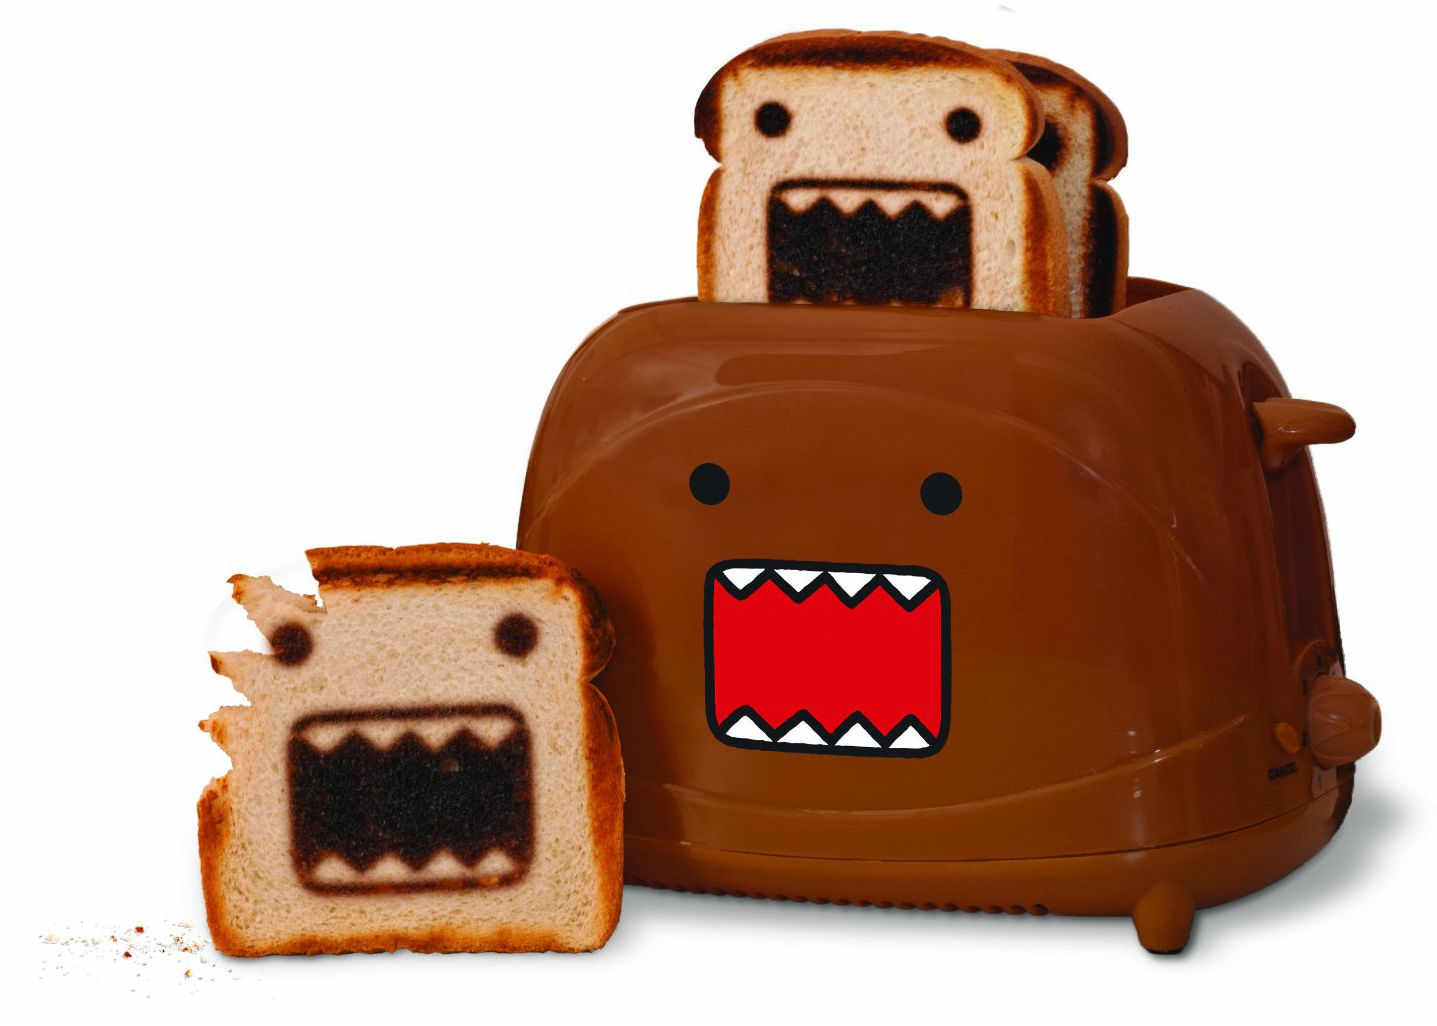 Cool Stuff: Domo Toaster [Times New Geek]